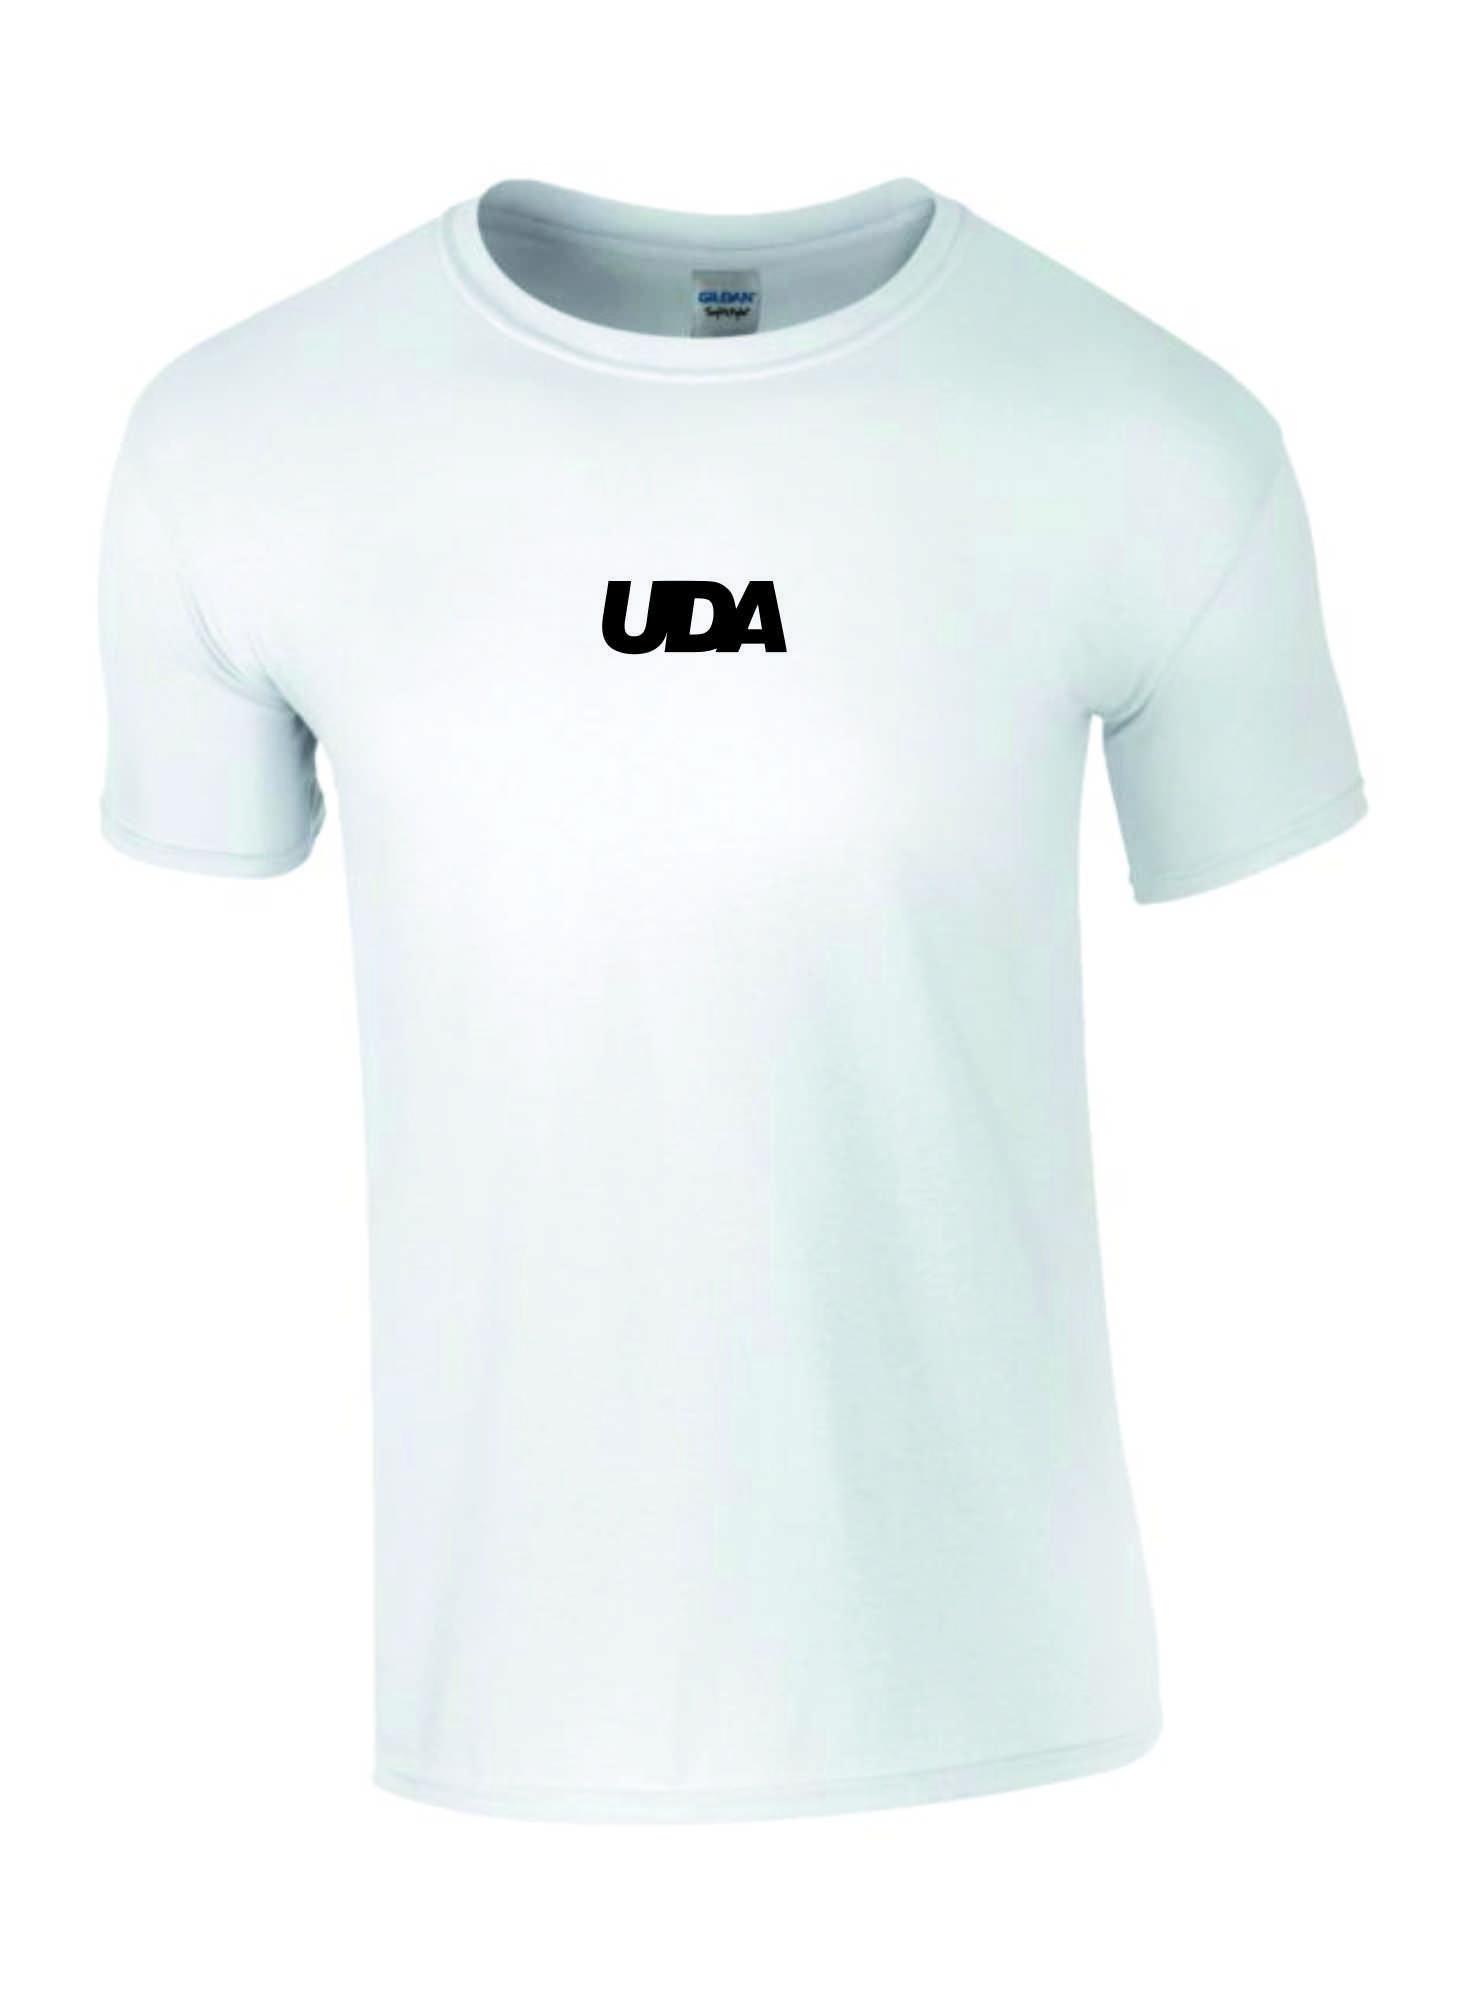 LIMITED EDITION: UDA – Kids T-Shirt (White & Black)